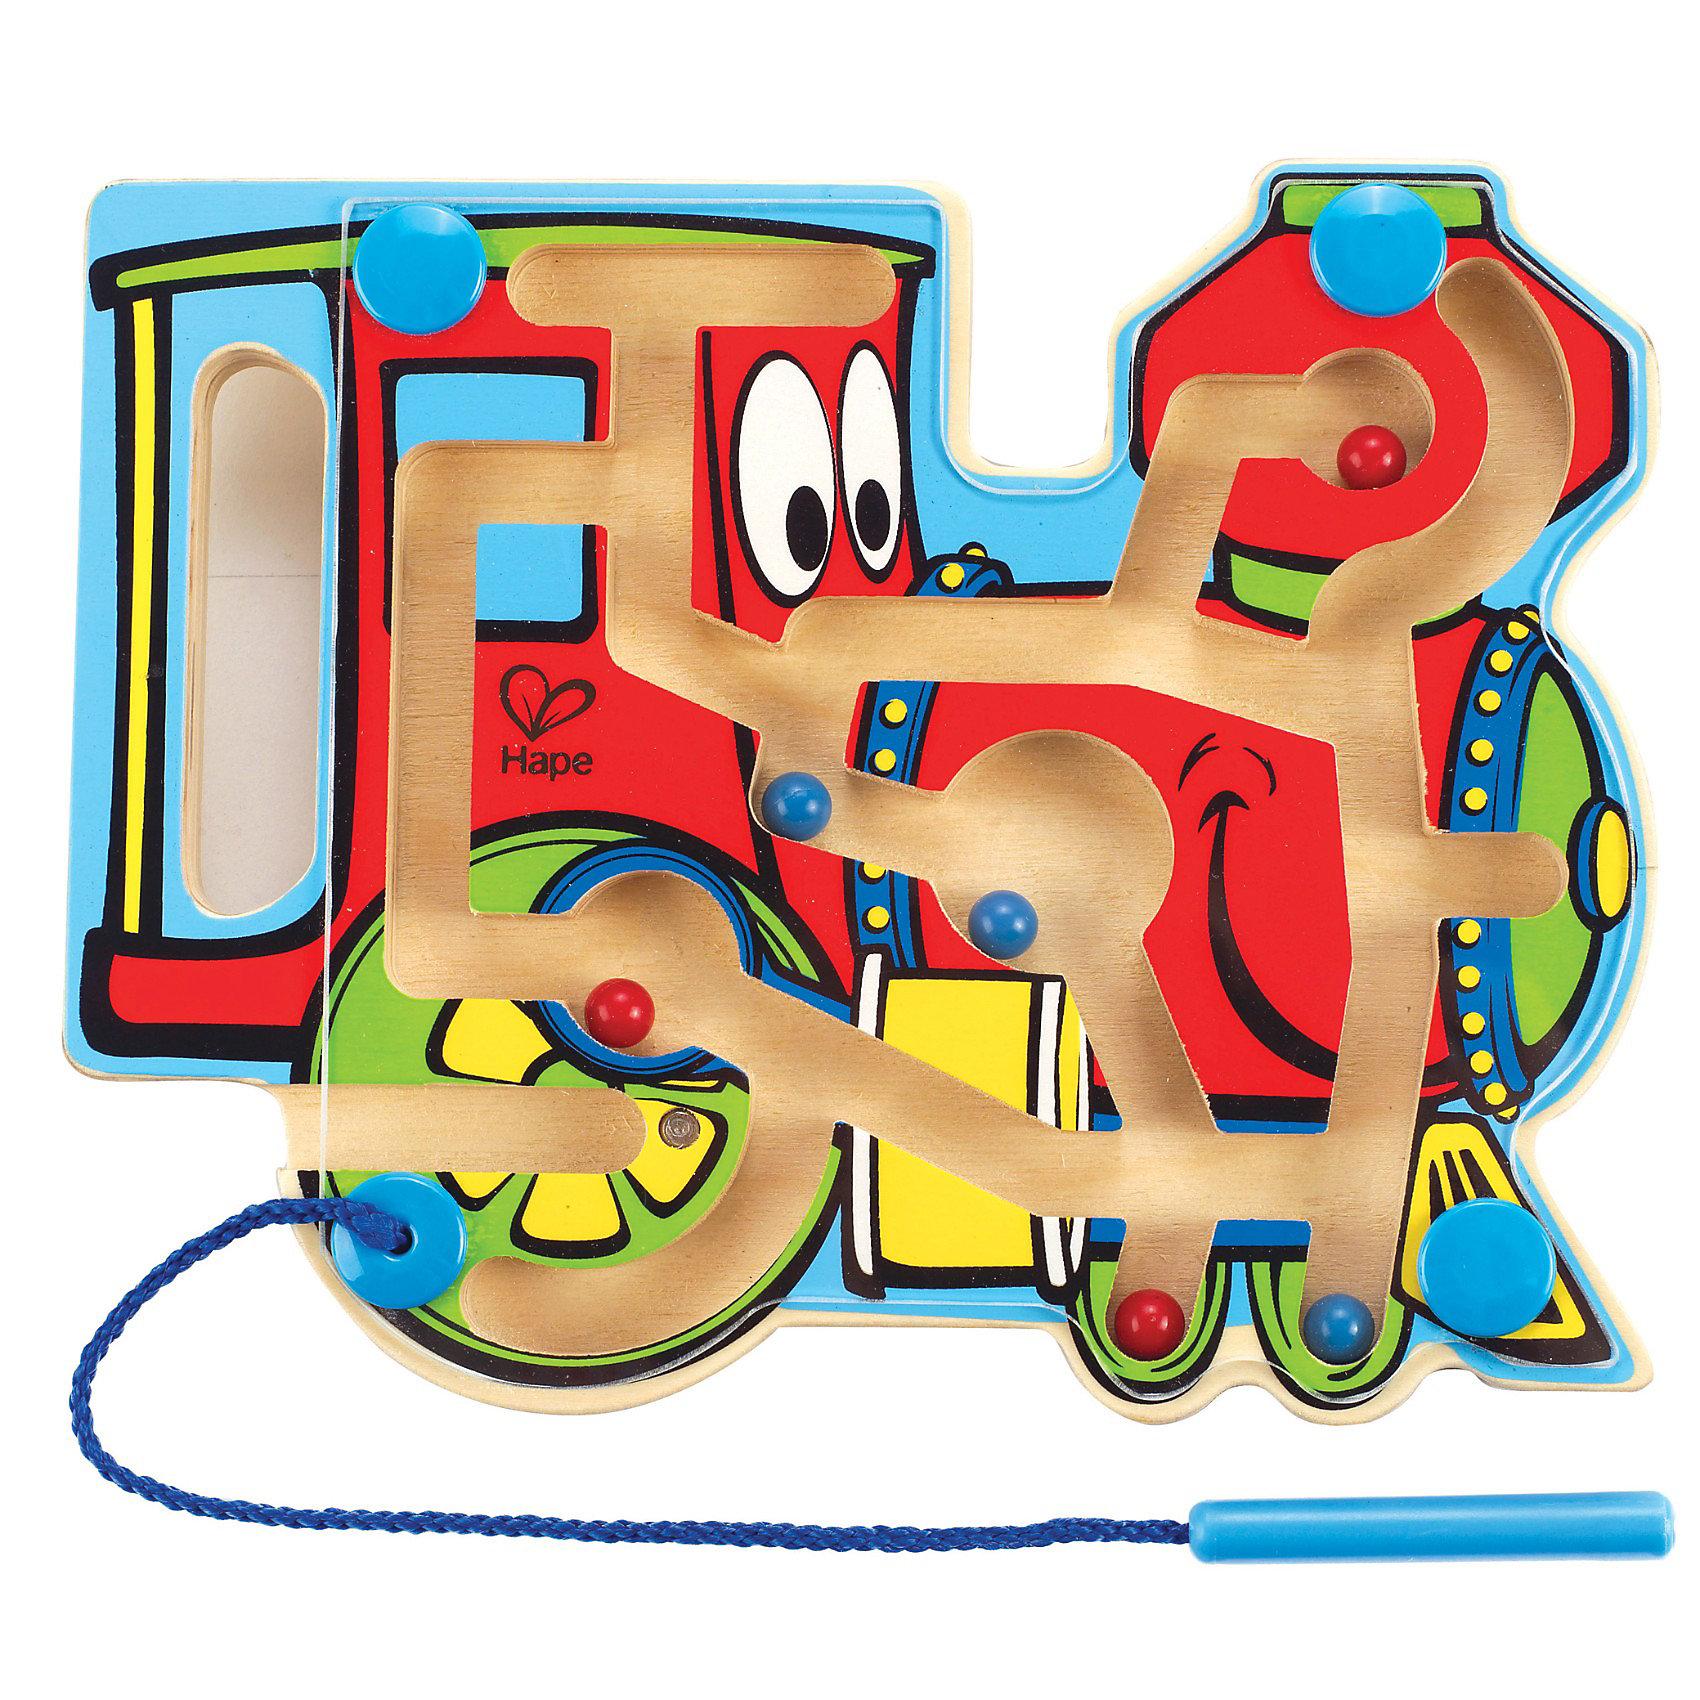 Hape Игрушка деревянная Паровозик-лабиринт, Hape hape деревянная музыкальная игрушка бубен